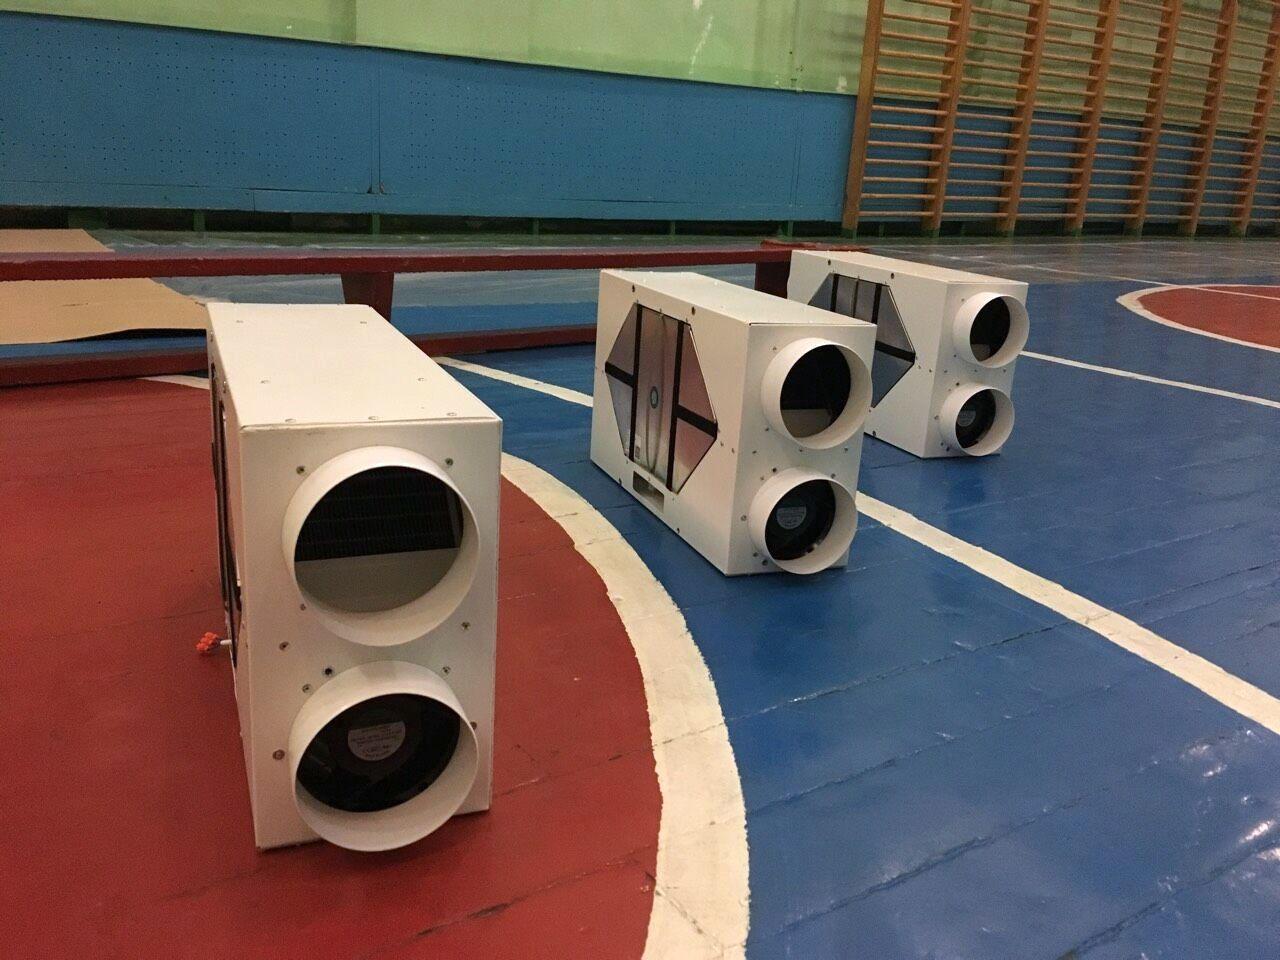 Монтаж рекуператора Ventoxx 350 в школьном спортзале